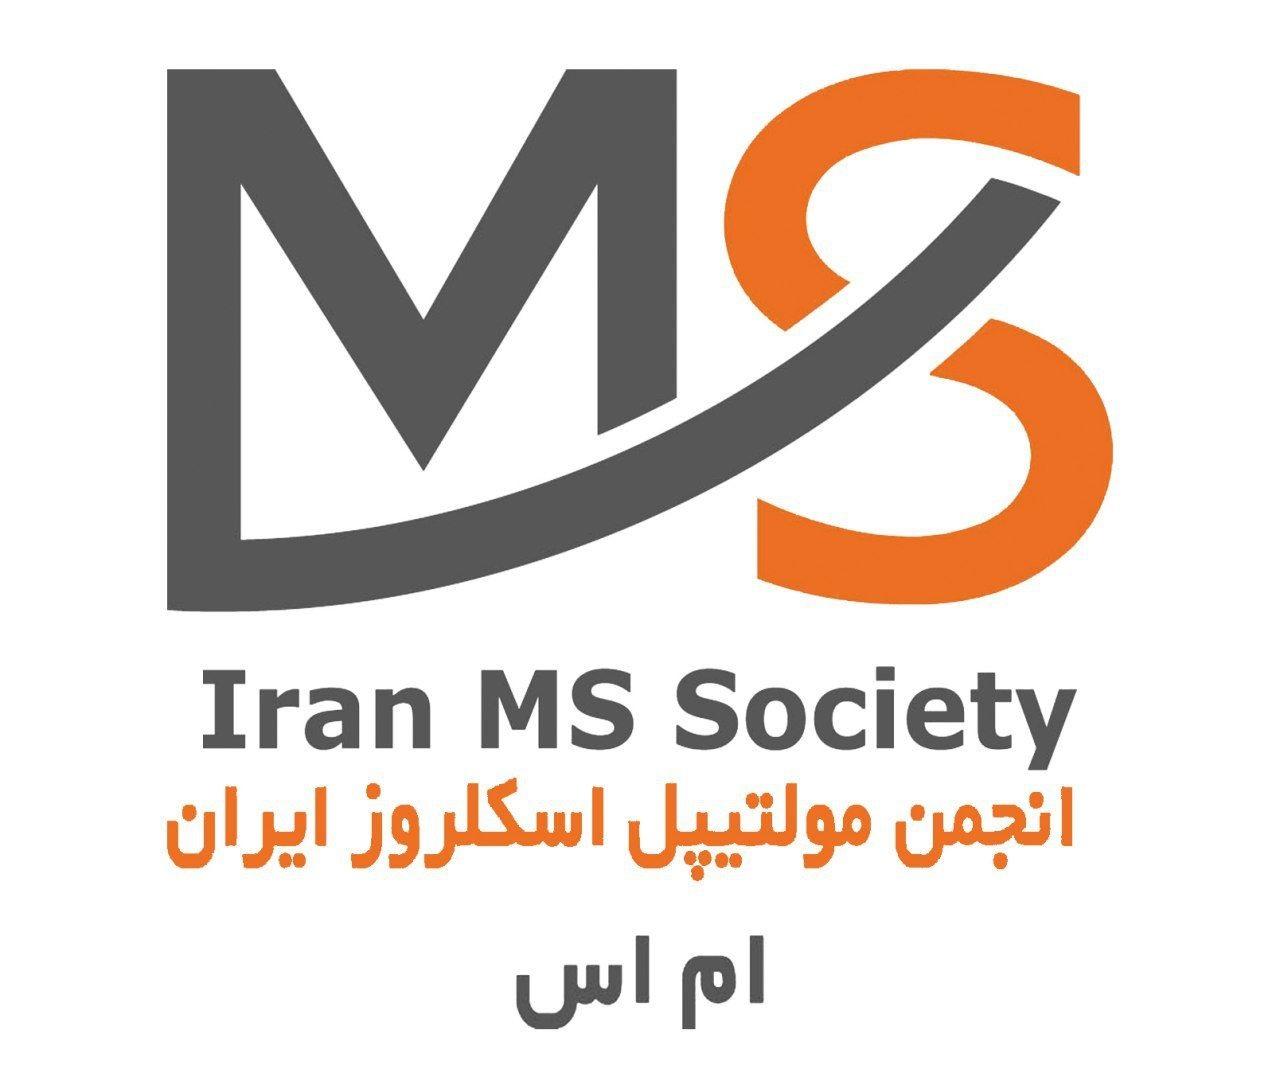 انجمن ام اس